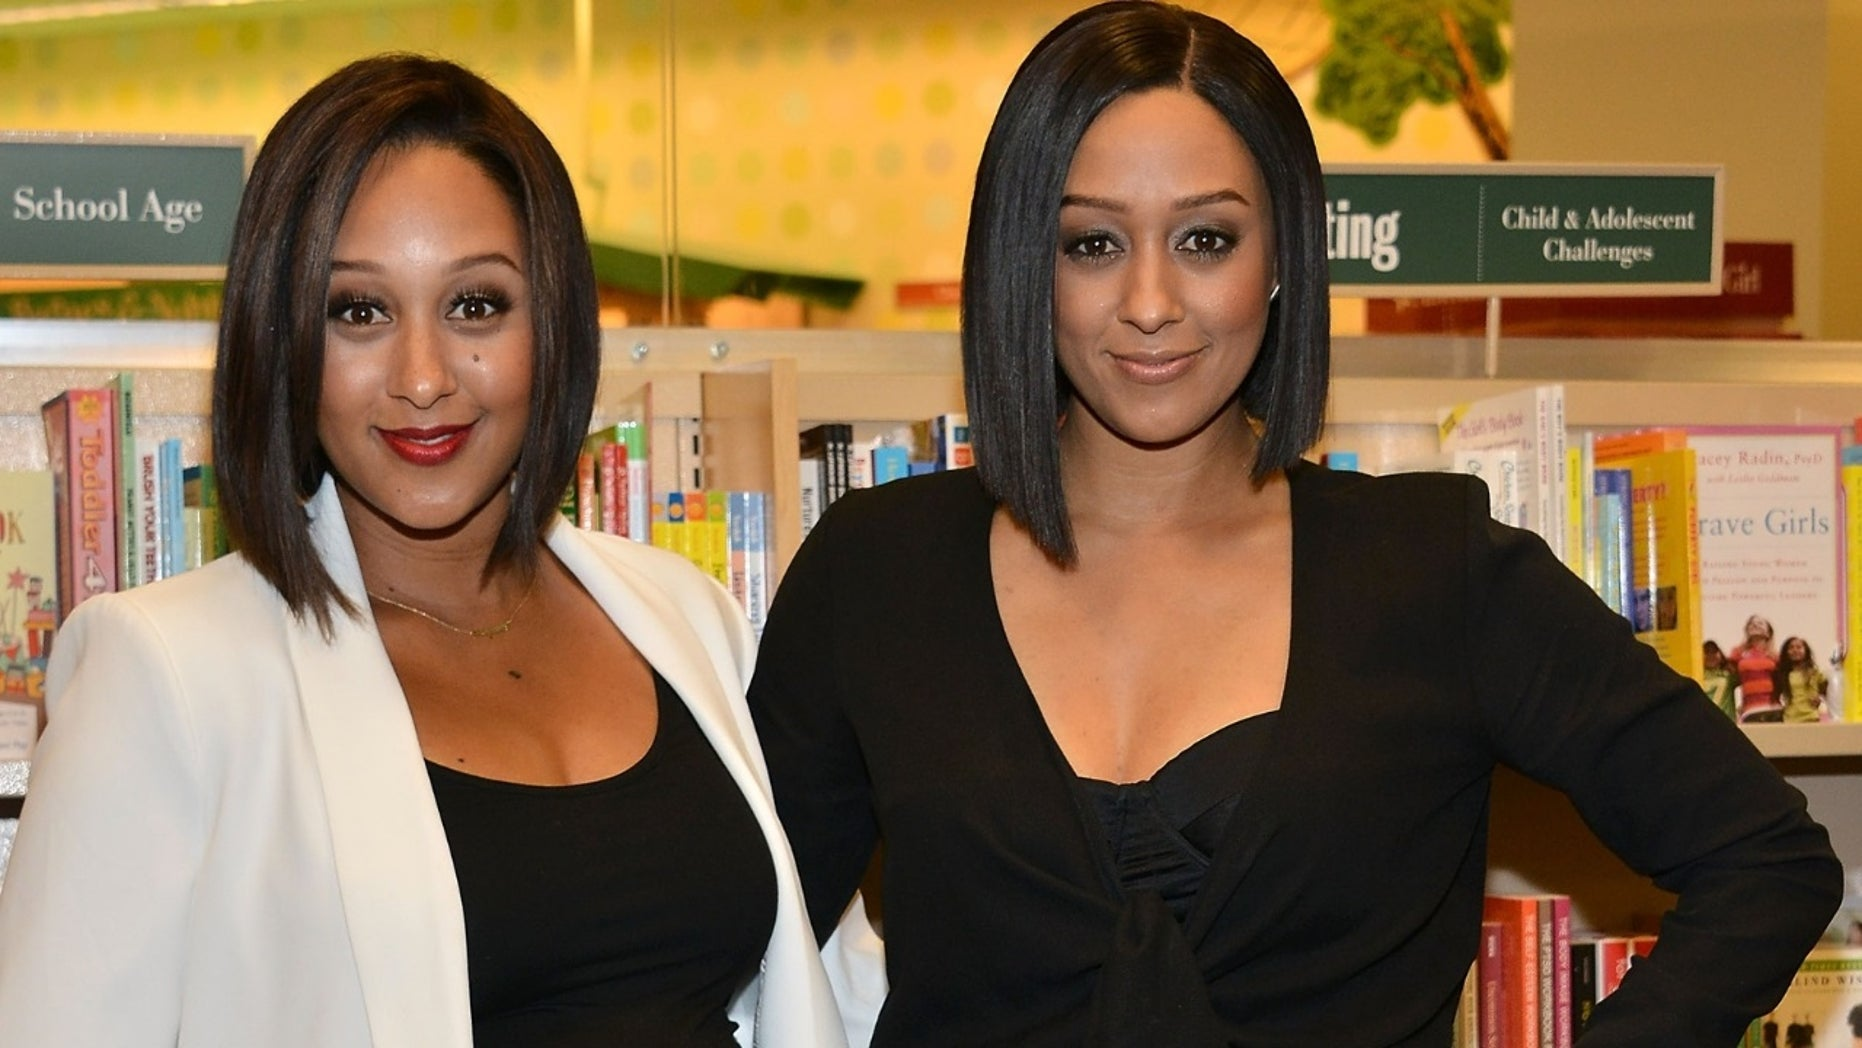 Tamera Mowry-Housley [left] drank her twin sister Tia Mowry-Hardrict's [